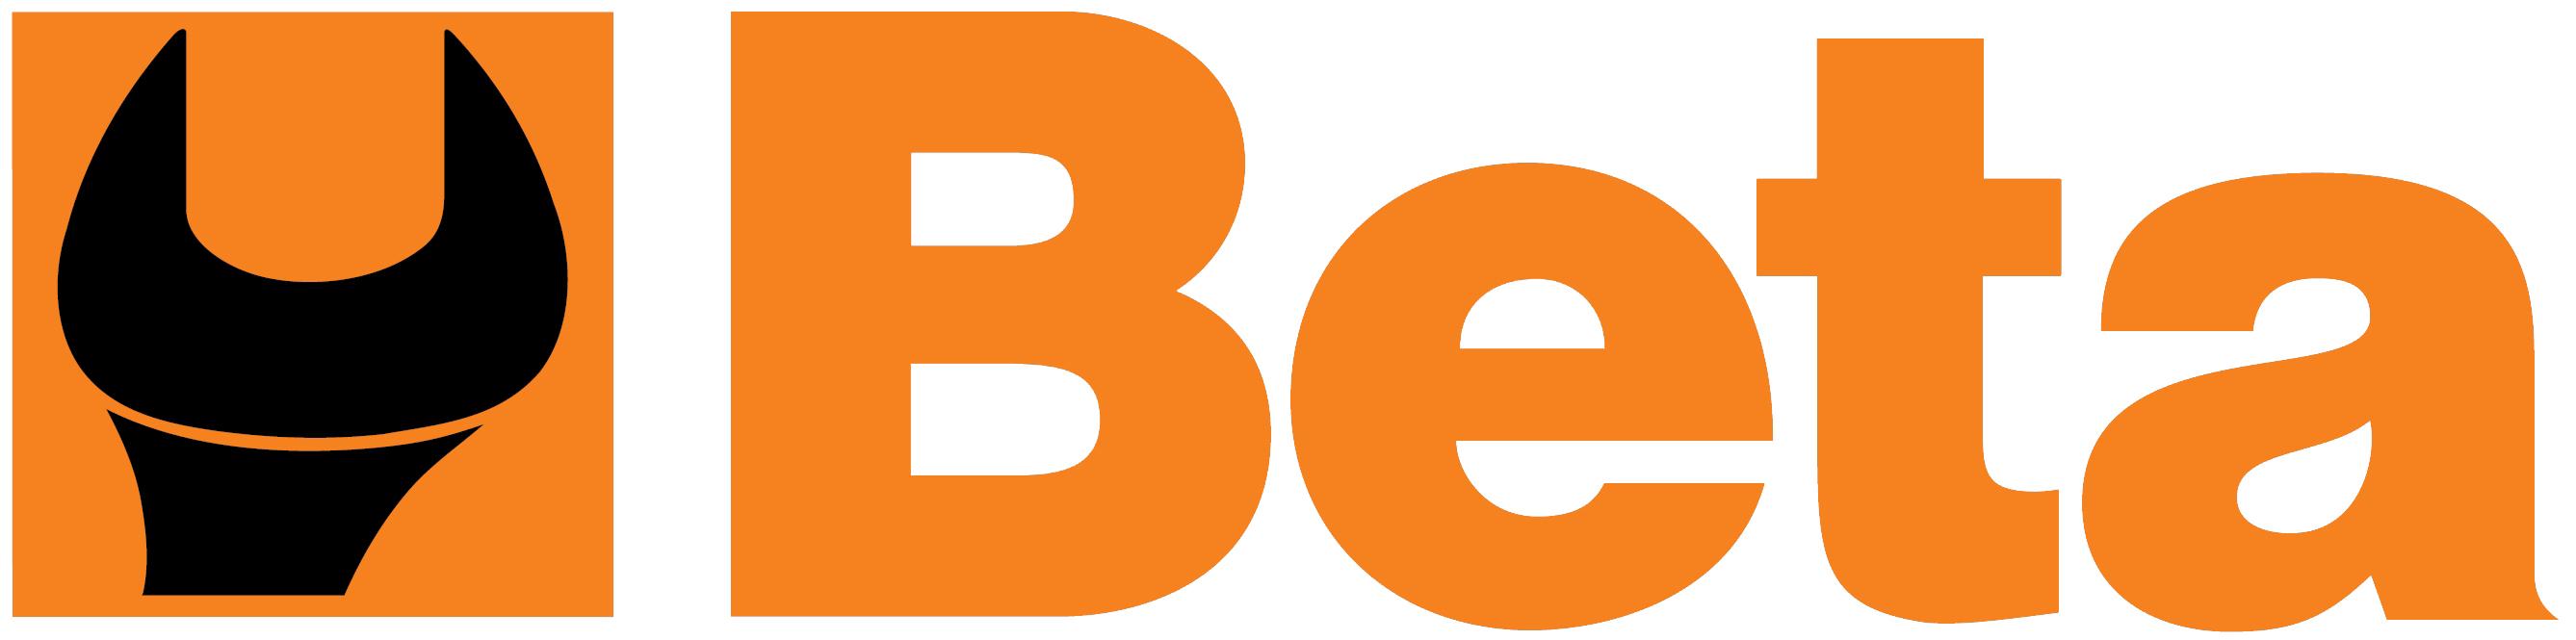 668006_beta